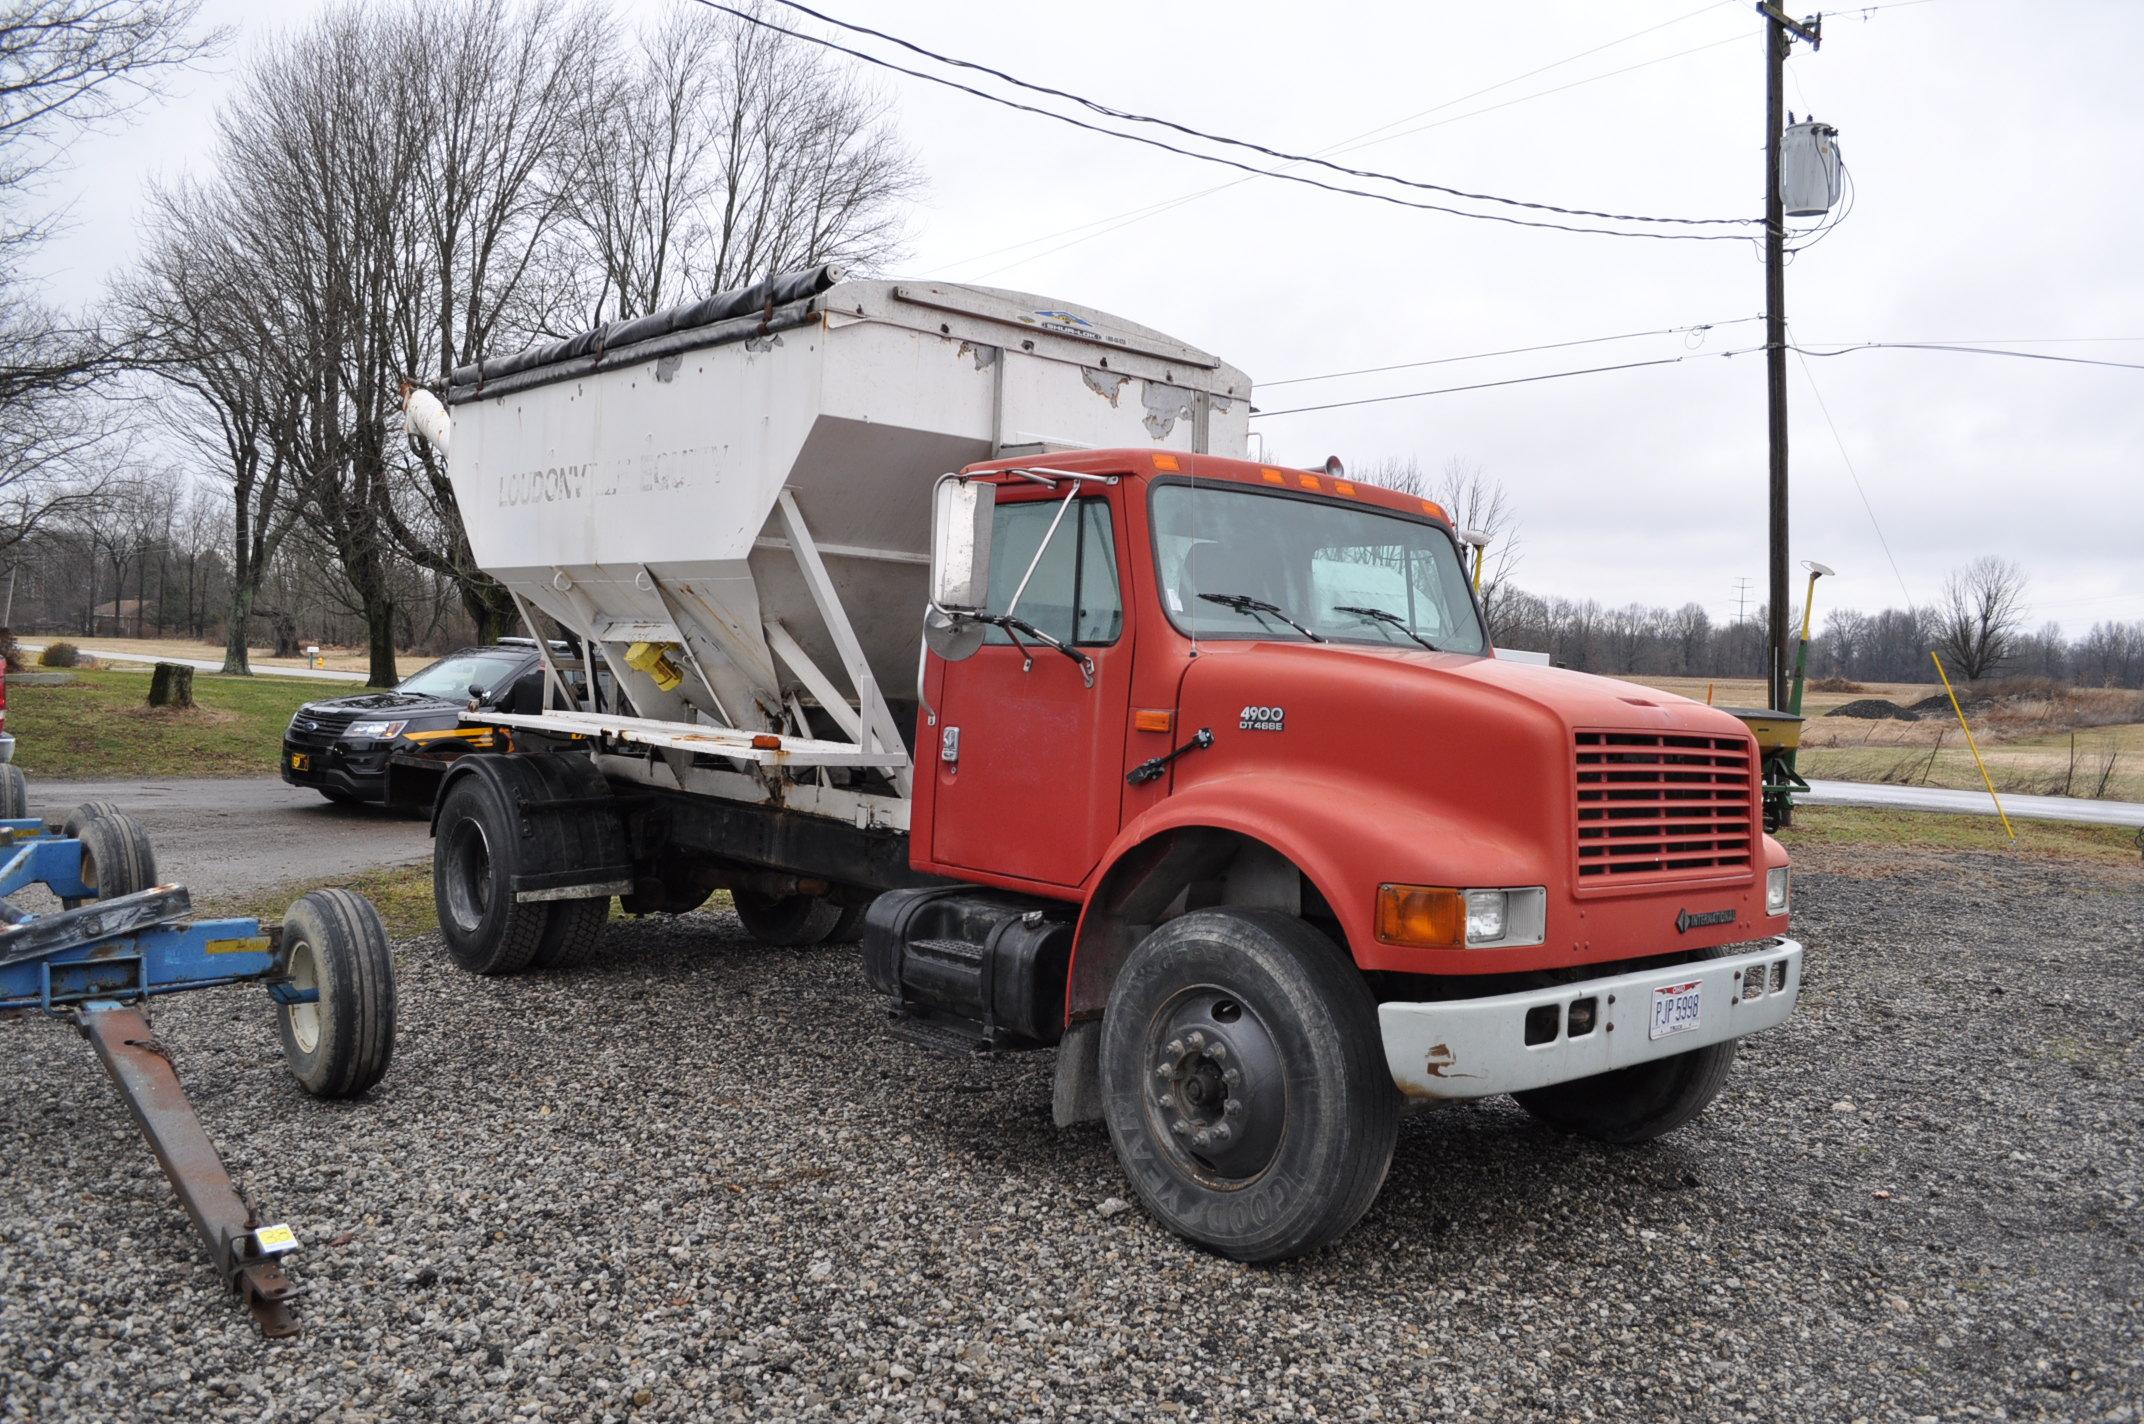 2000 International 4900 dry fertilizer tender truck, single axle, DT466E, Spicer 6 spd, spring ride, - Image 4 of 21